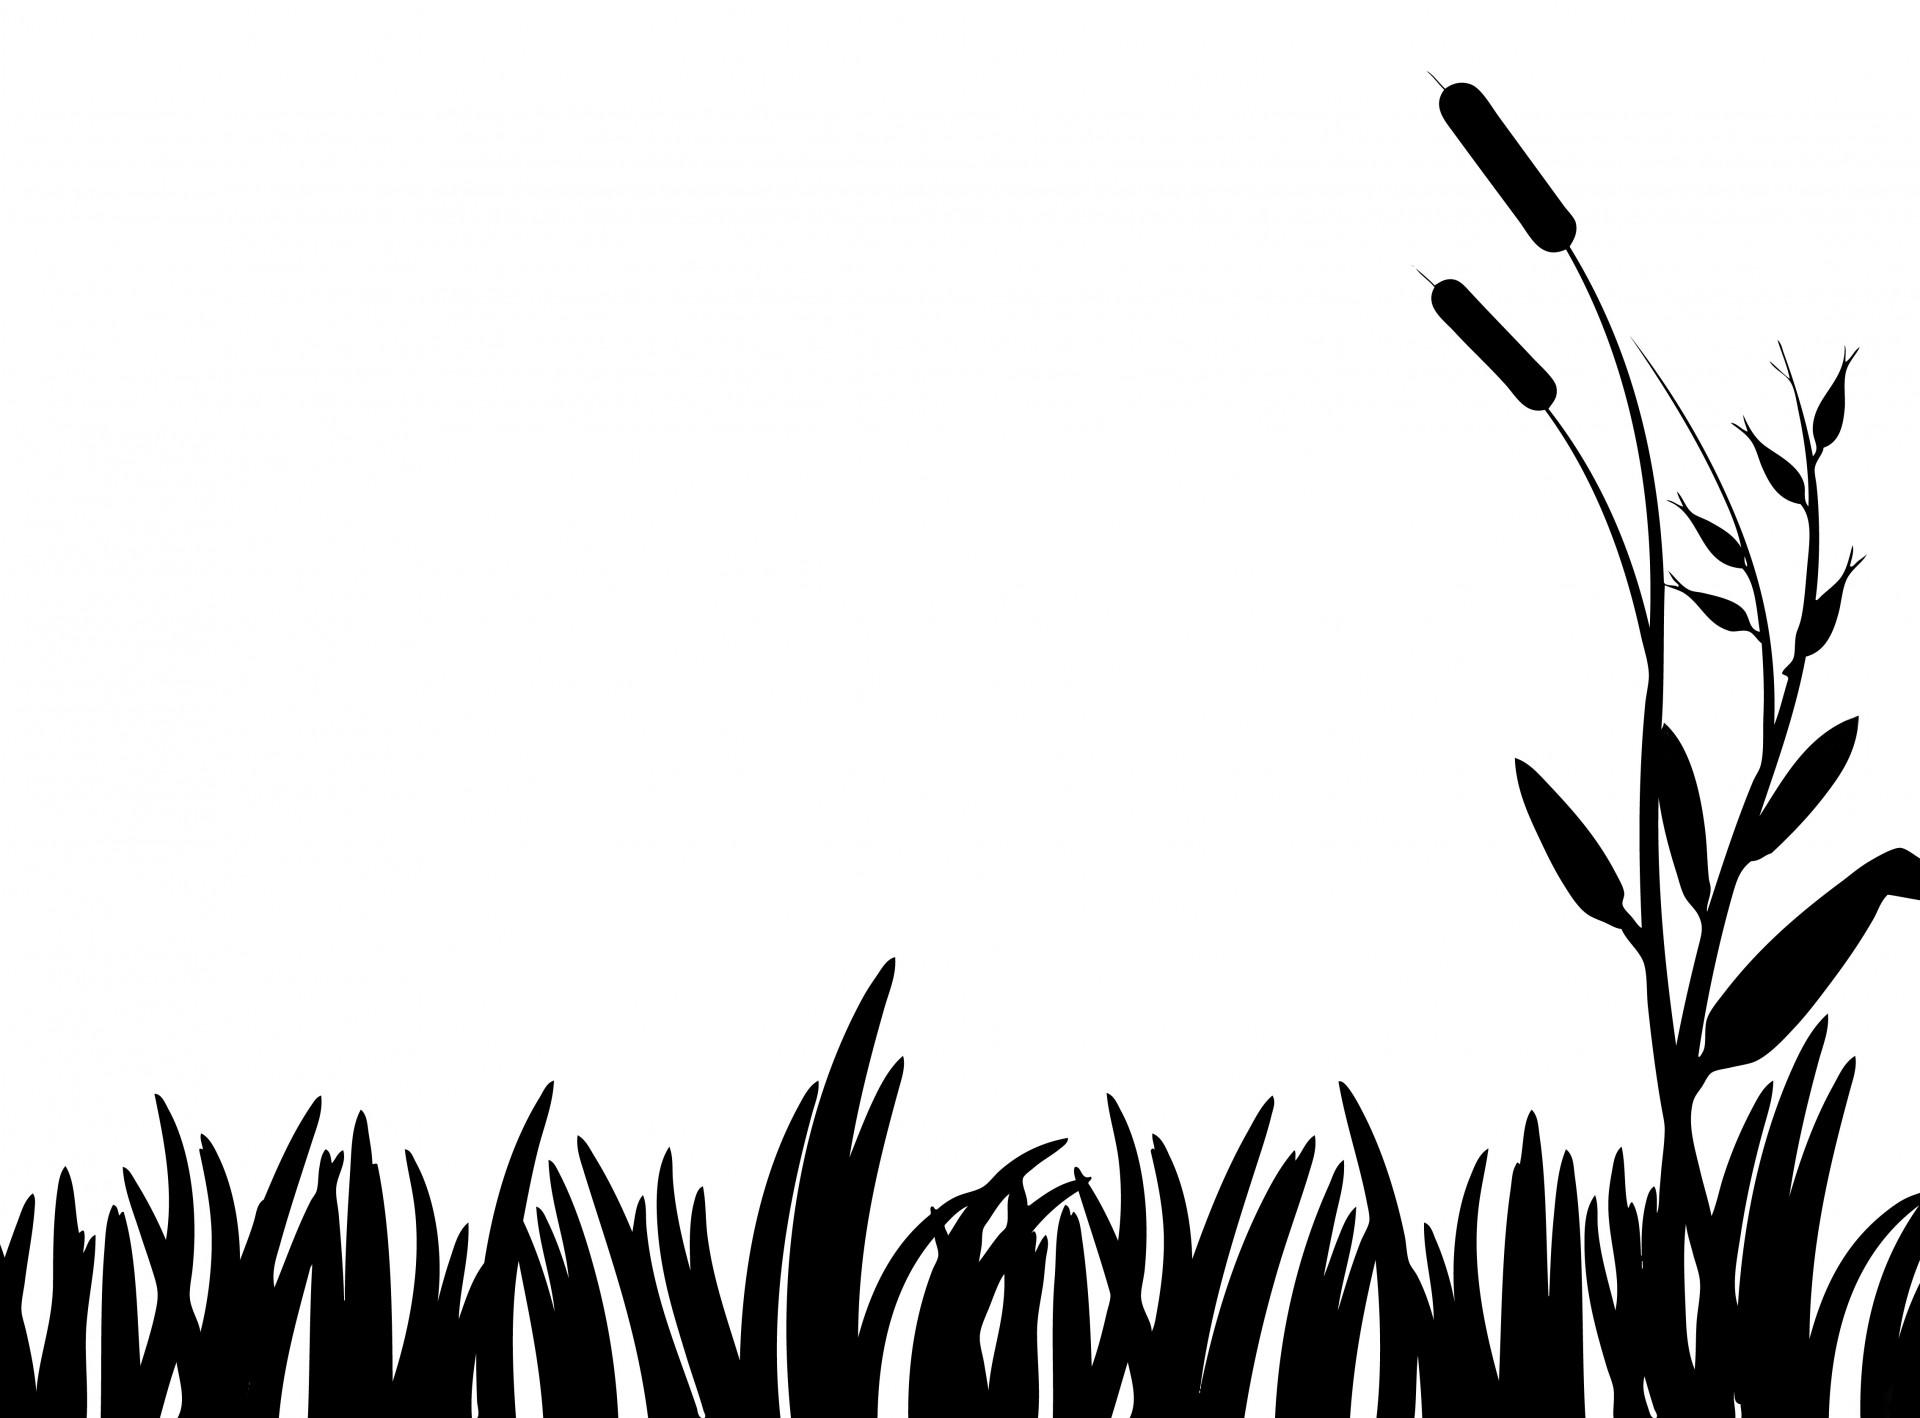 1920x1418 Grass Silhouette Clipart Free Stock Photo